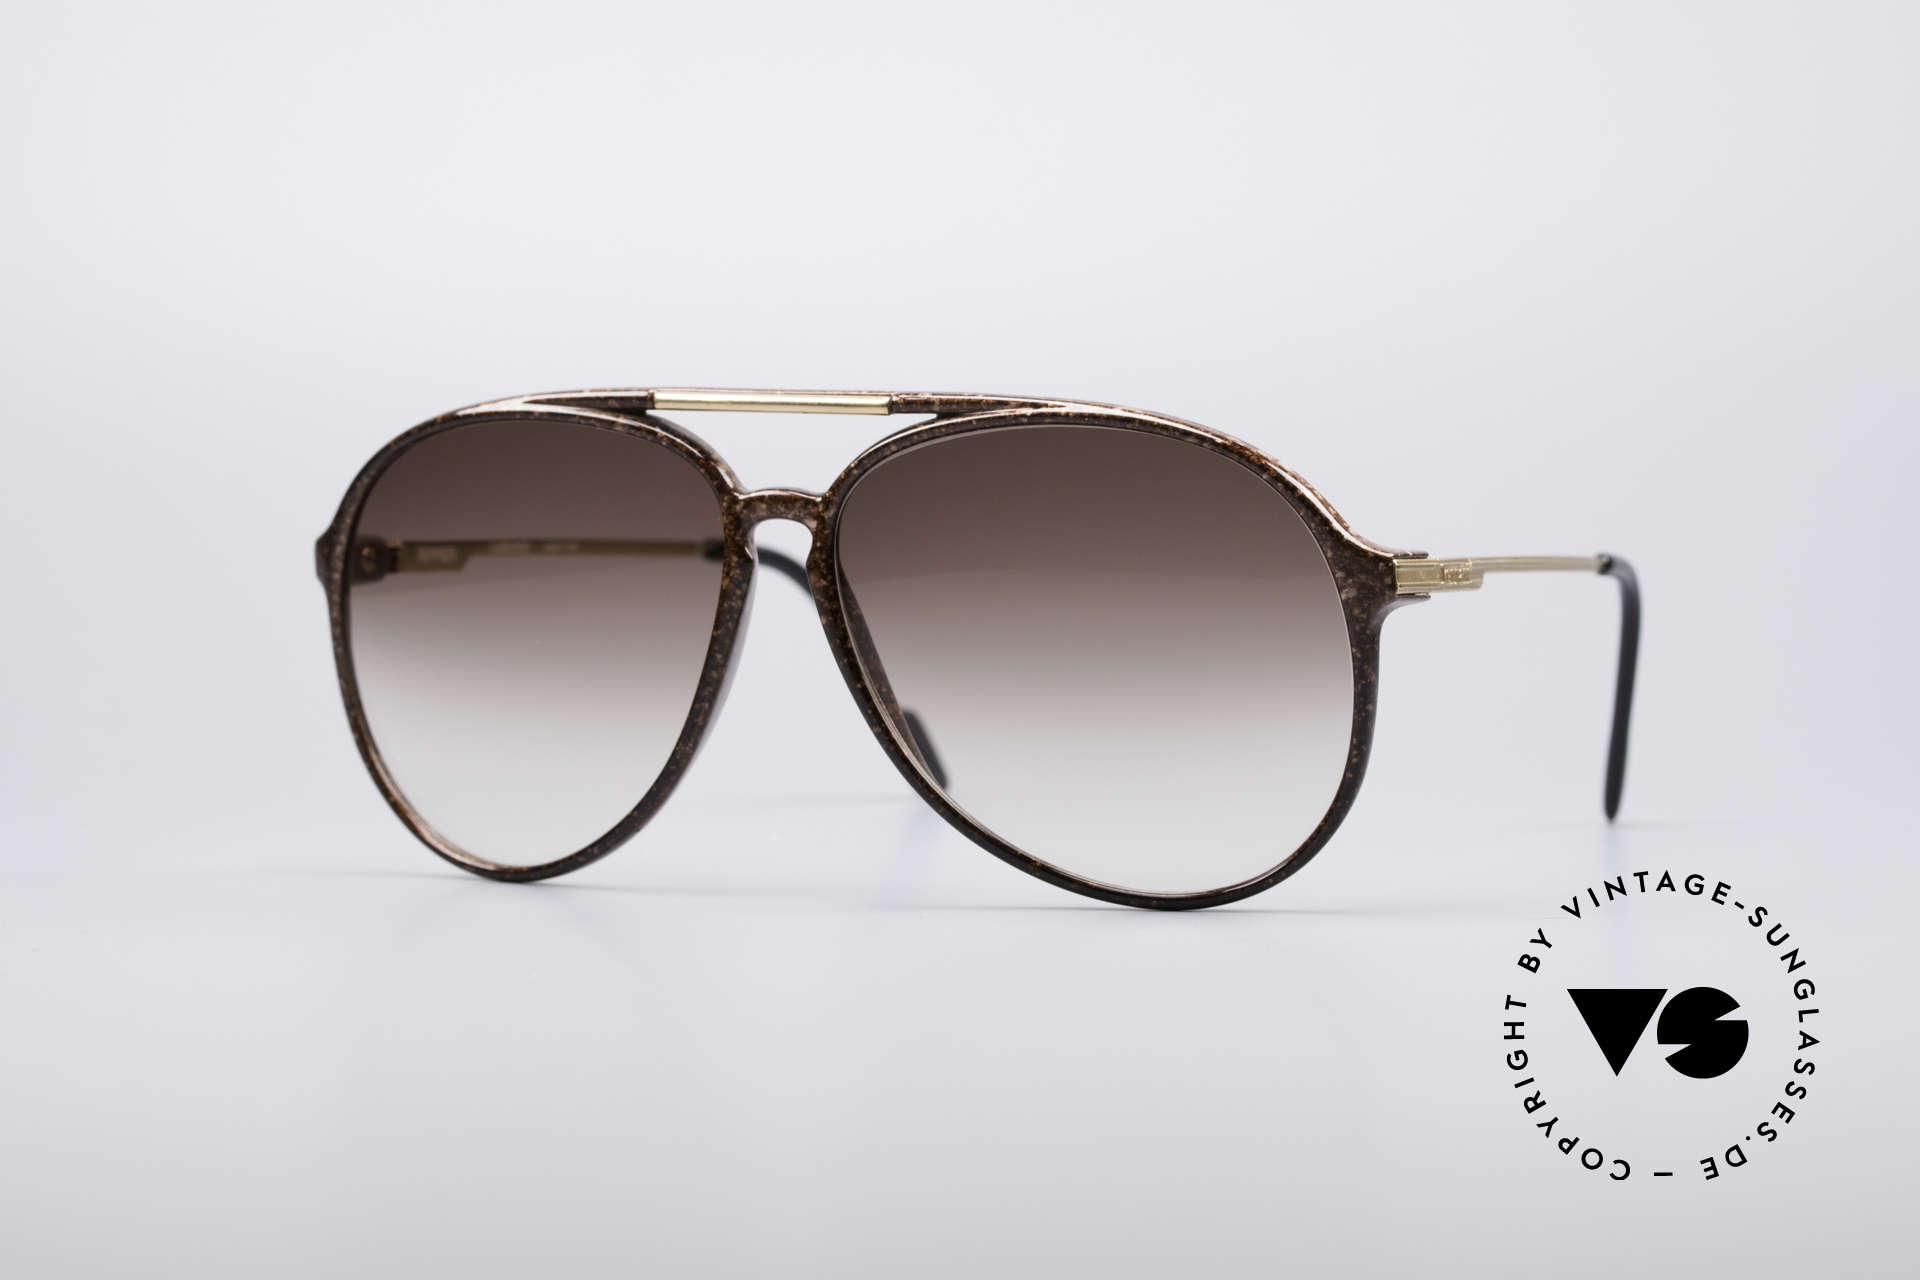 eyeglasses shop glasses c a com frames ca brand interglasses optical at ferrari canadian fr by